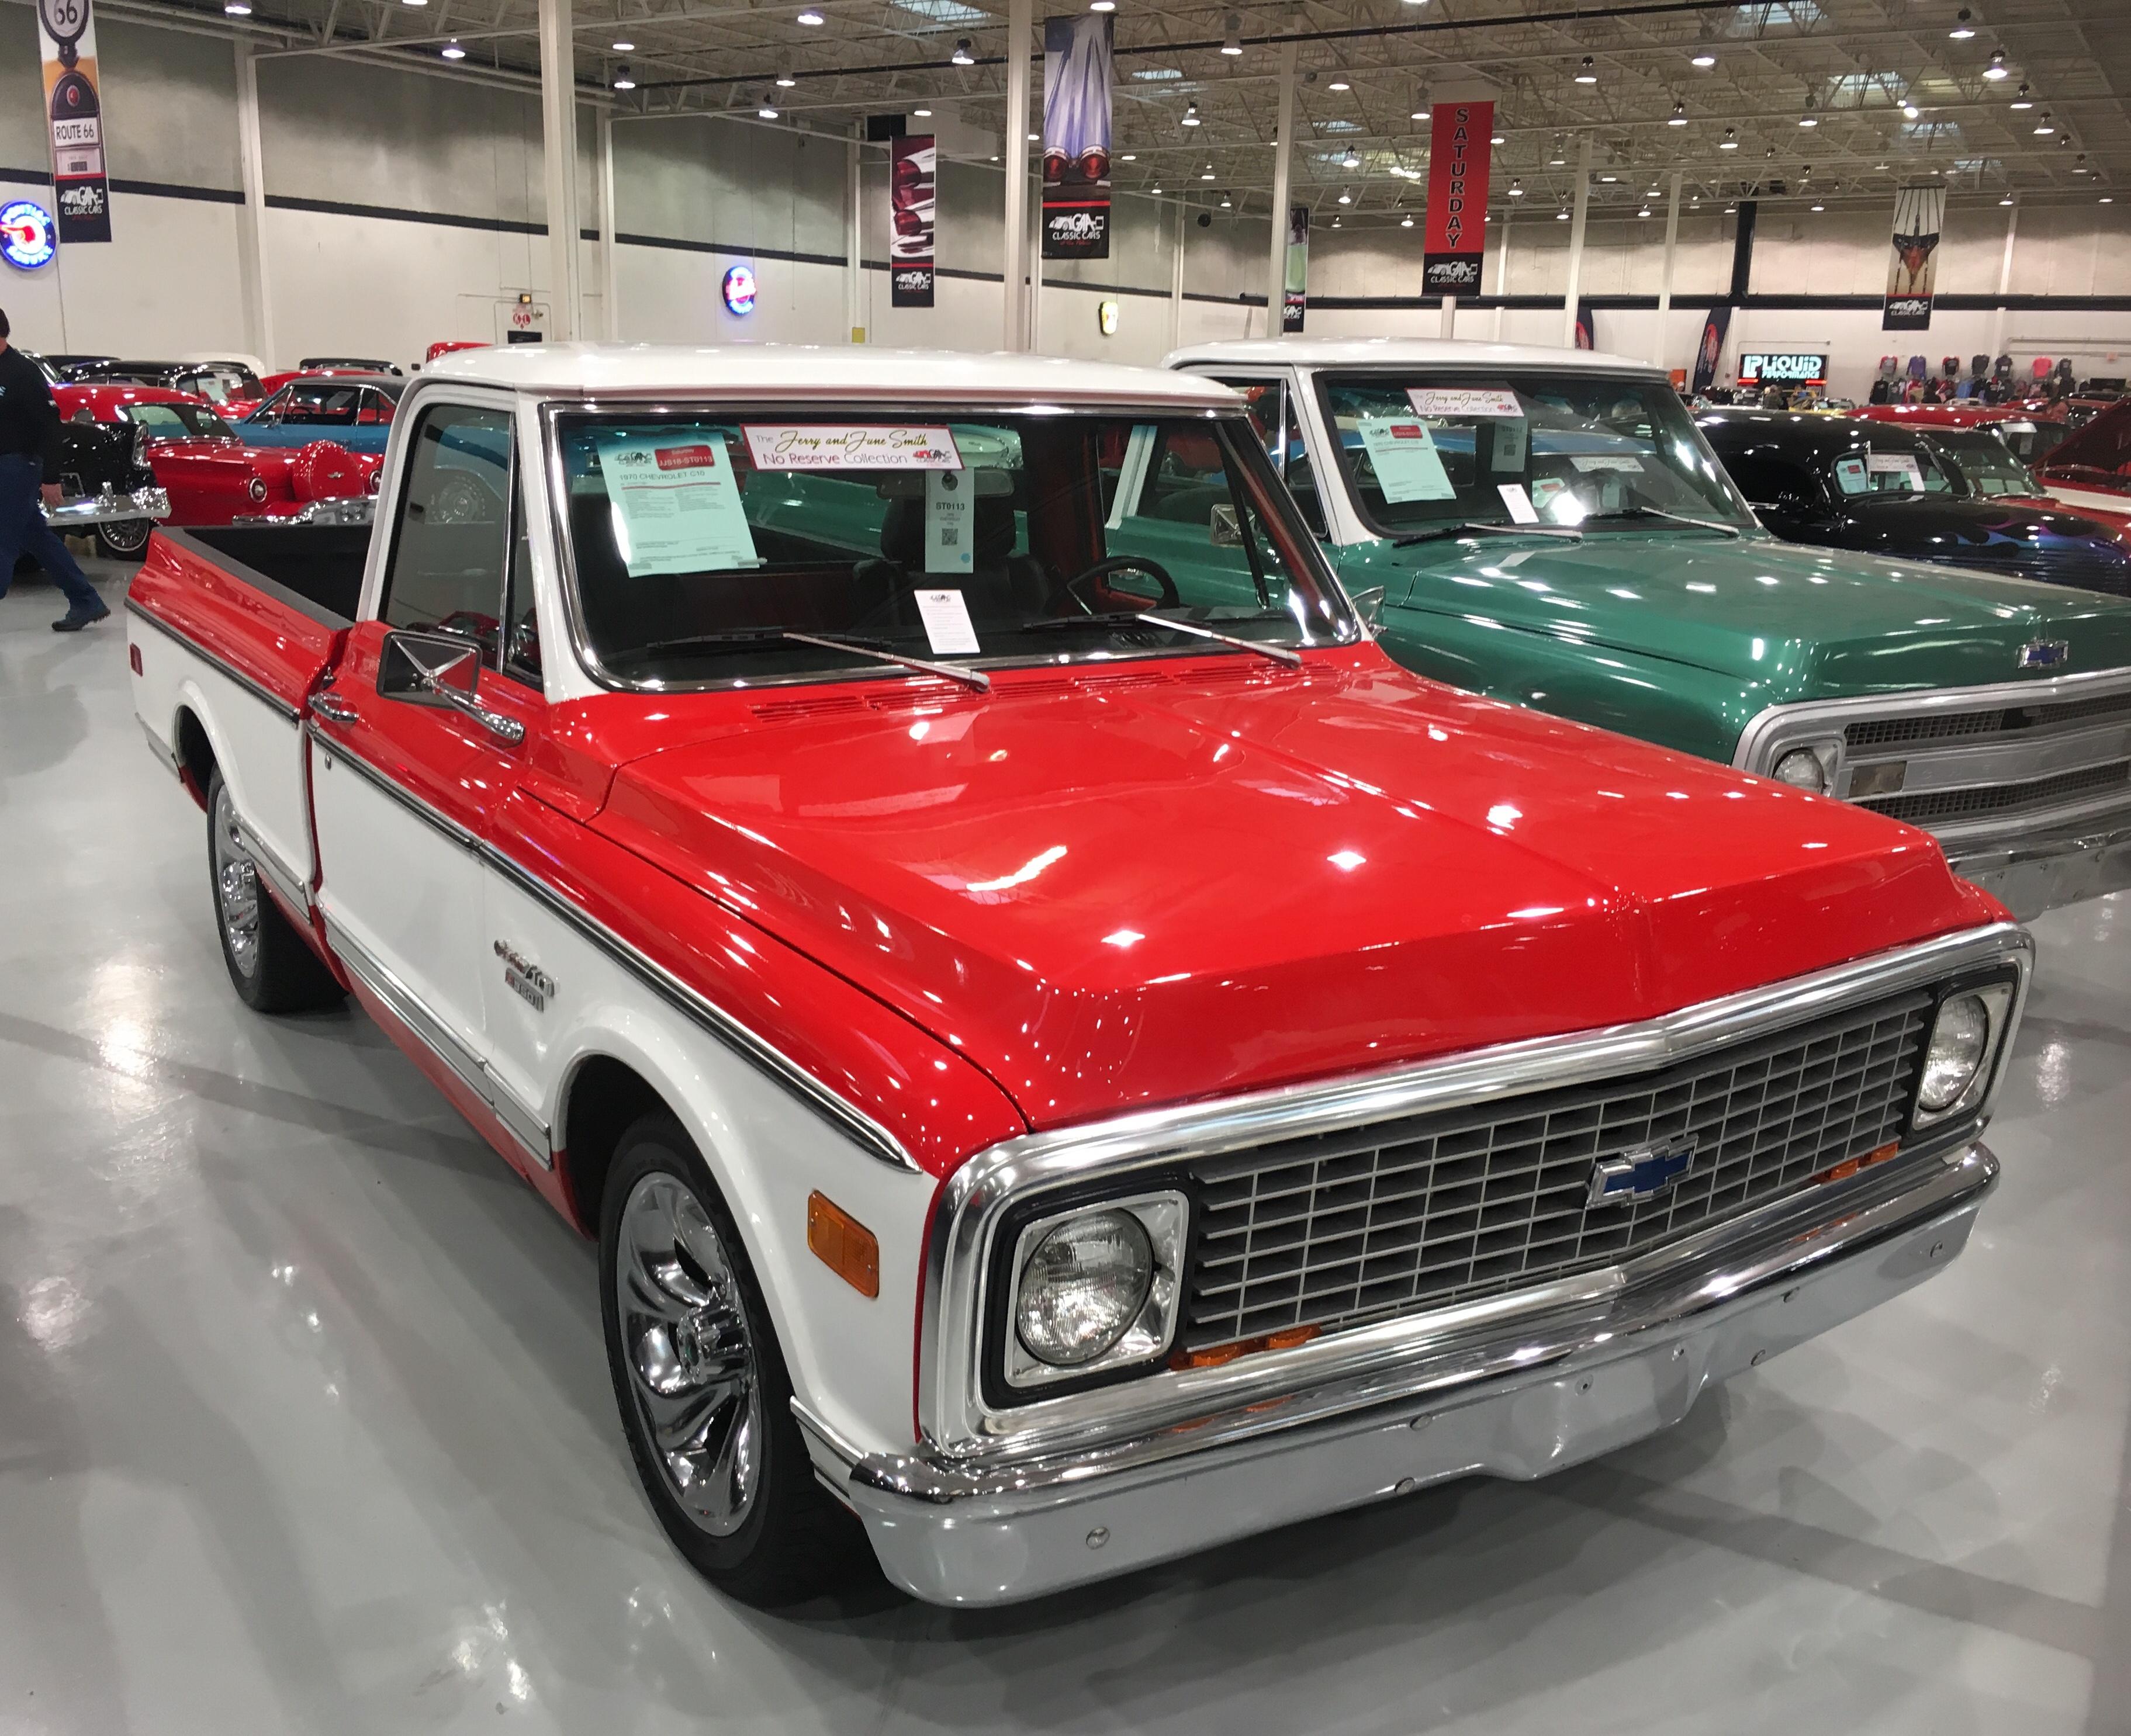 1970 Chevy C10 Pick-Up